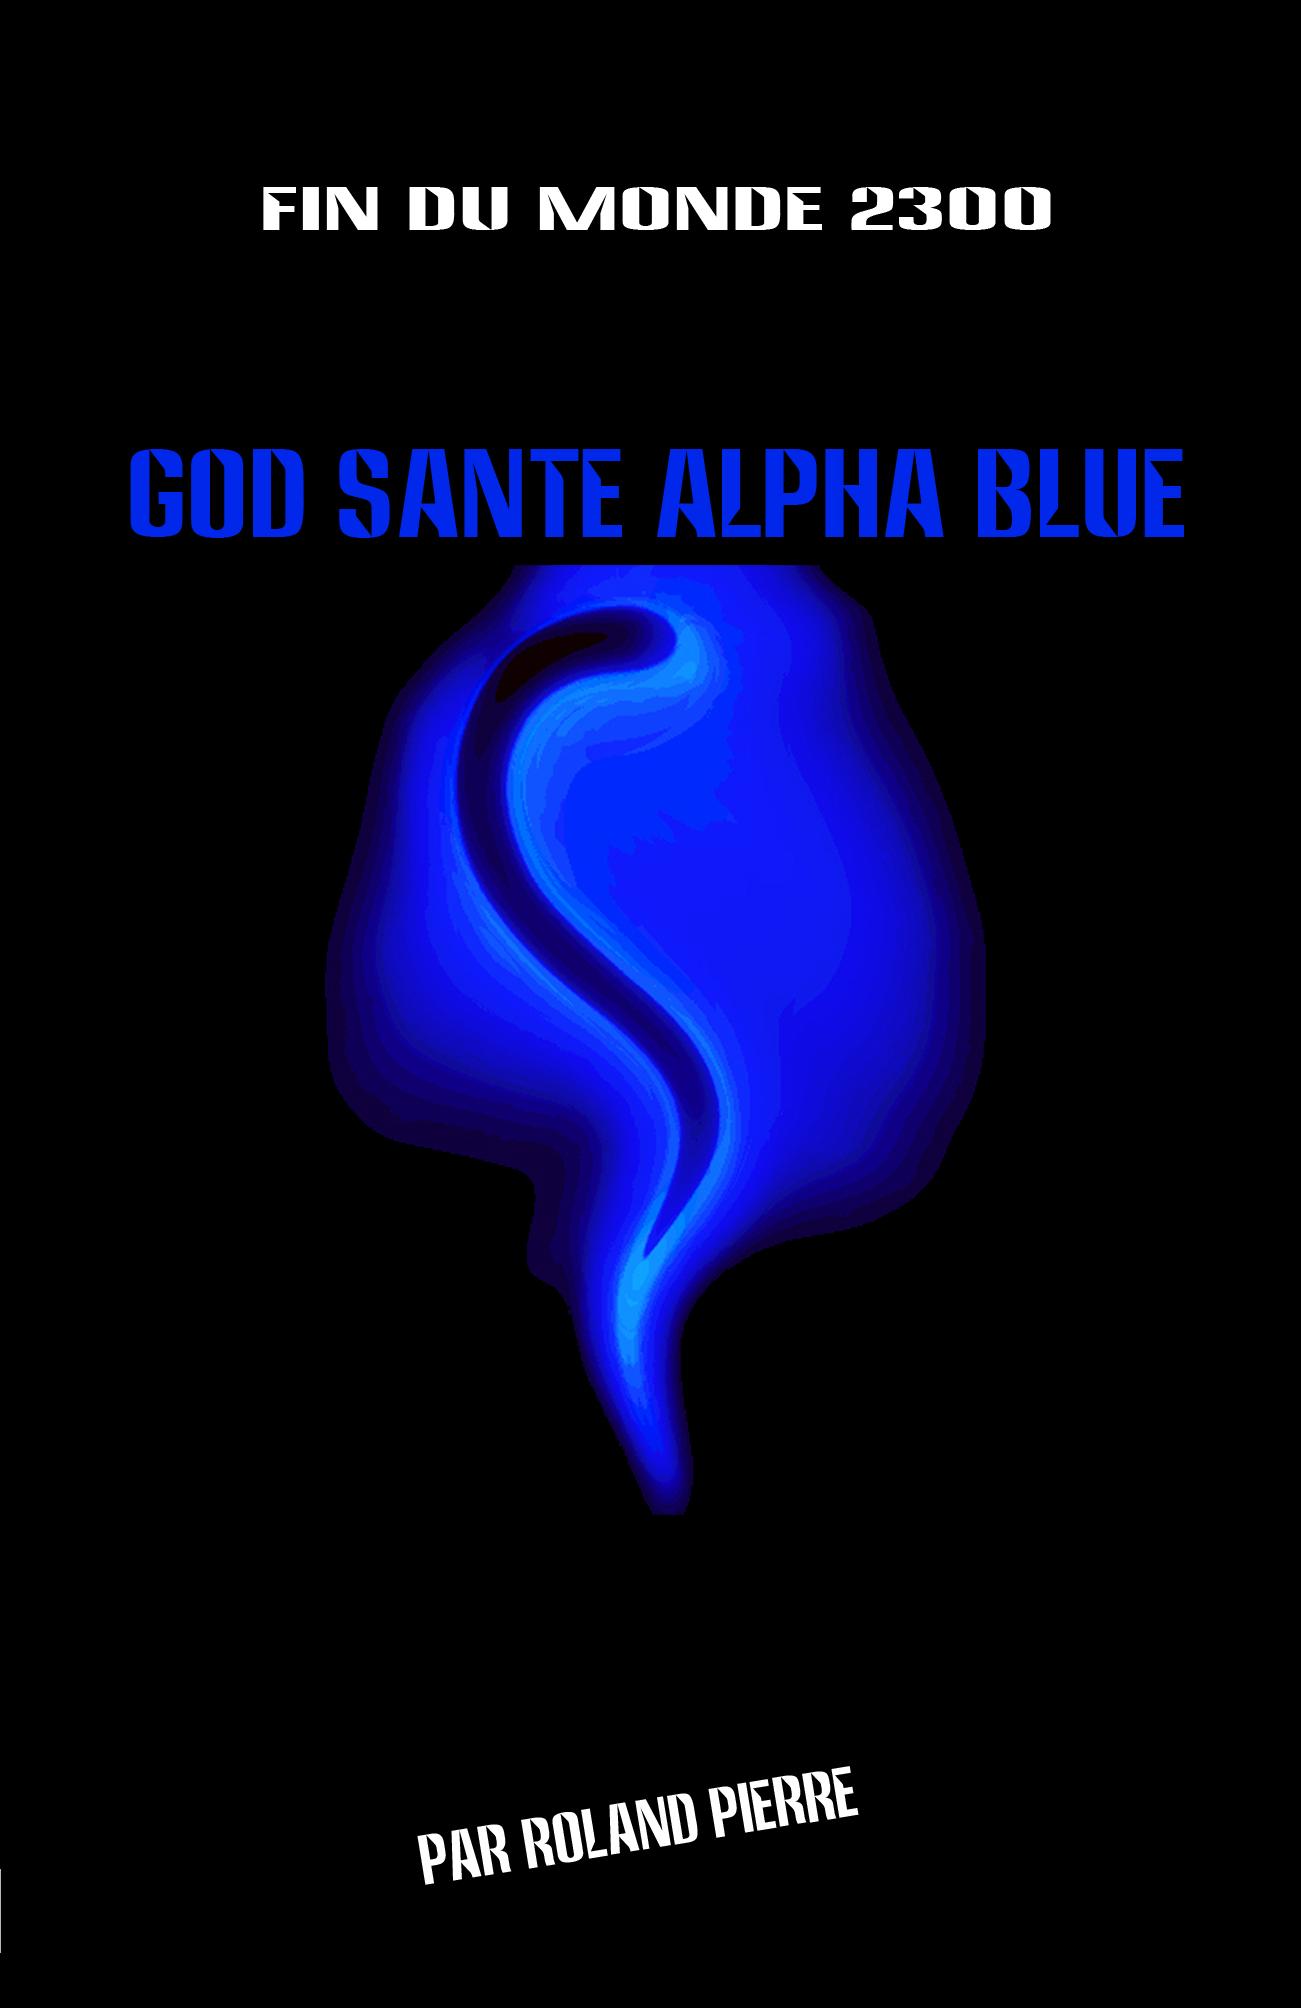 God Sante Alpha Blue